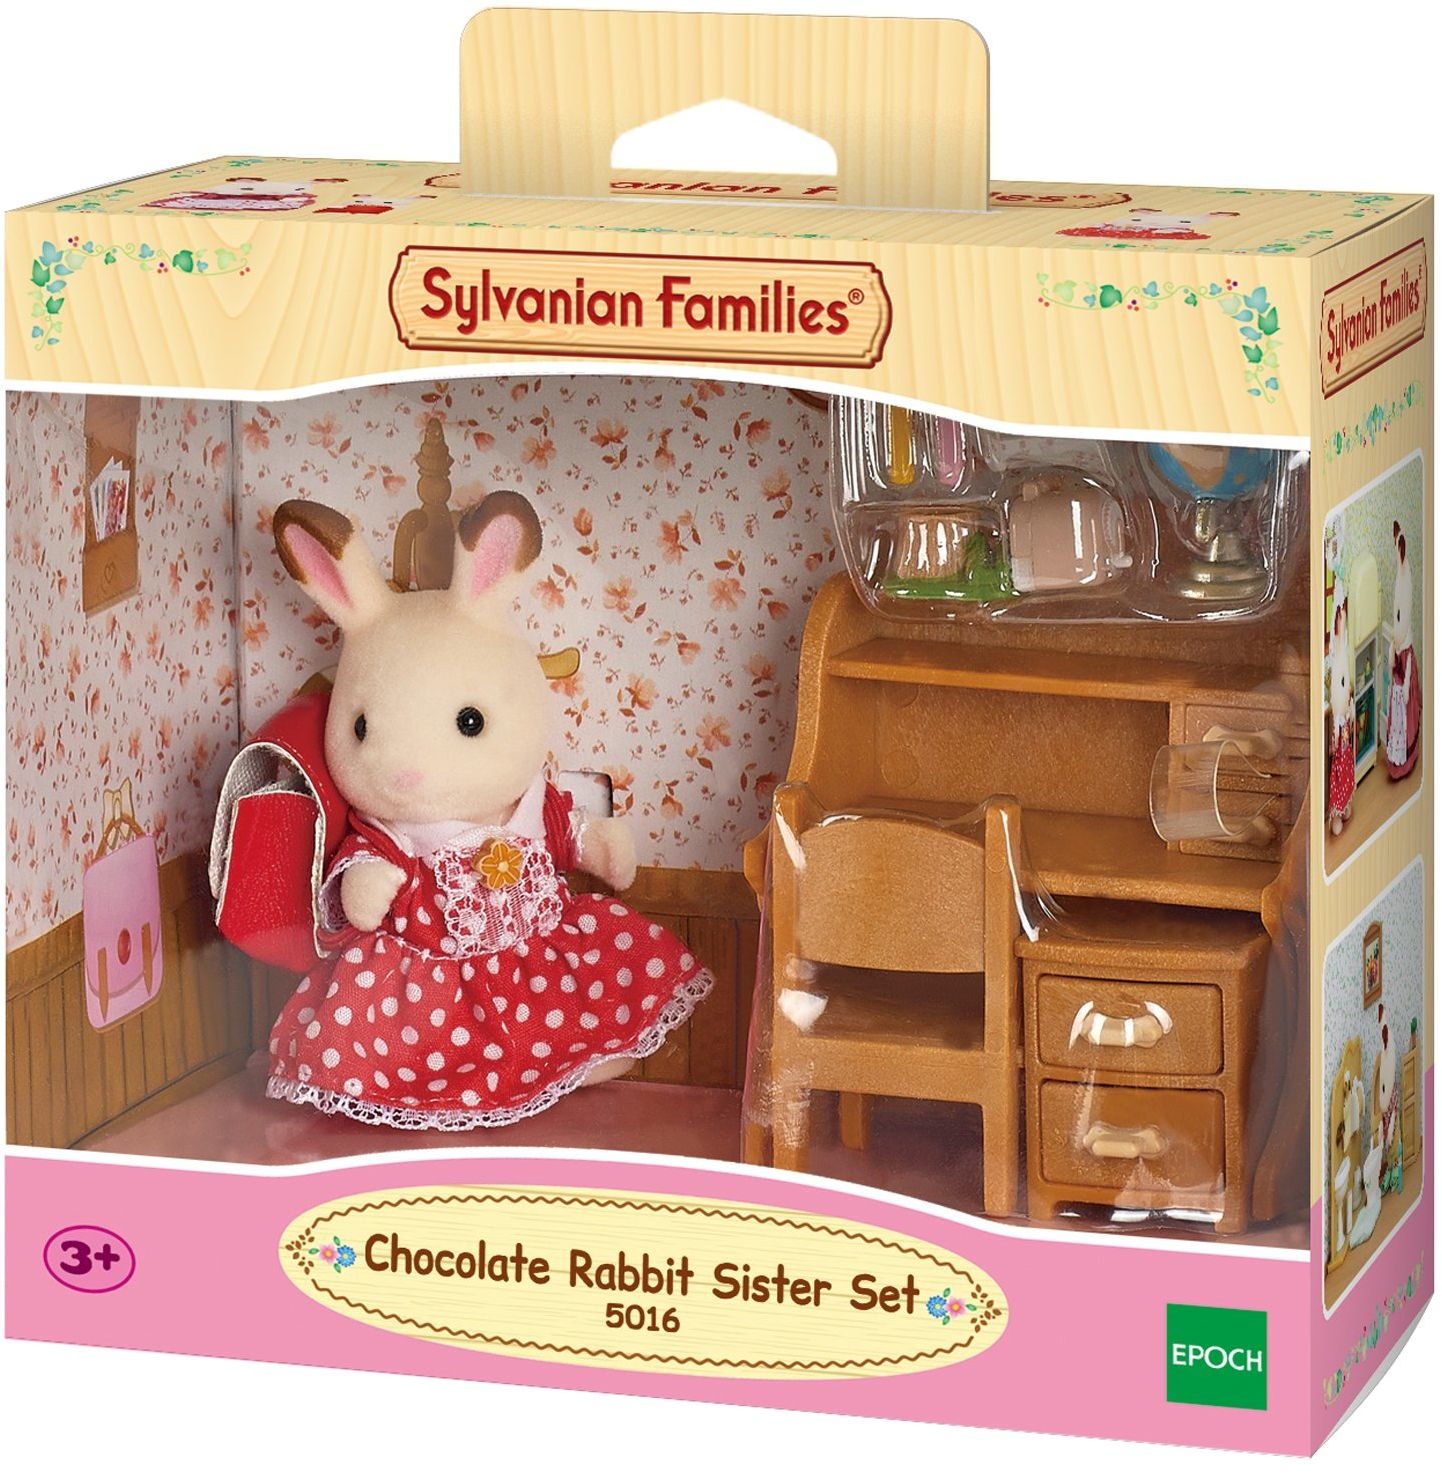 Sylvanian Families 5016 meble do domu dla lalek, wielokolorowe